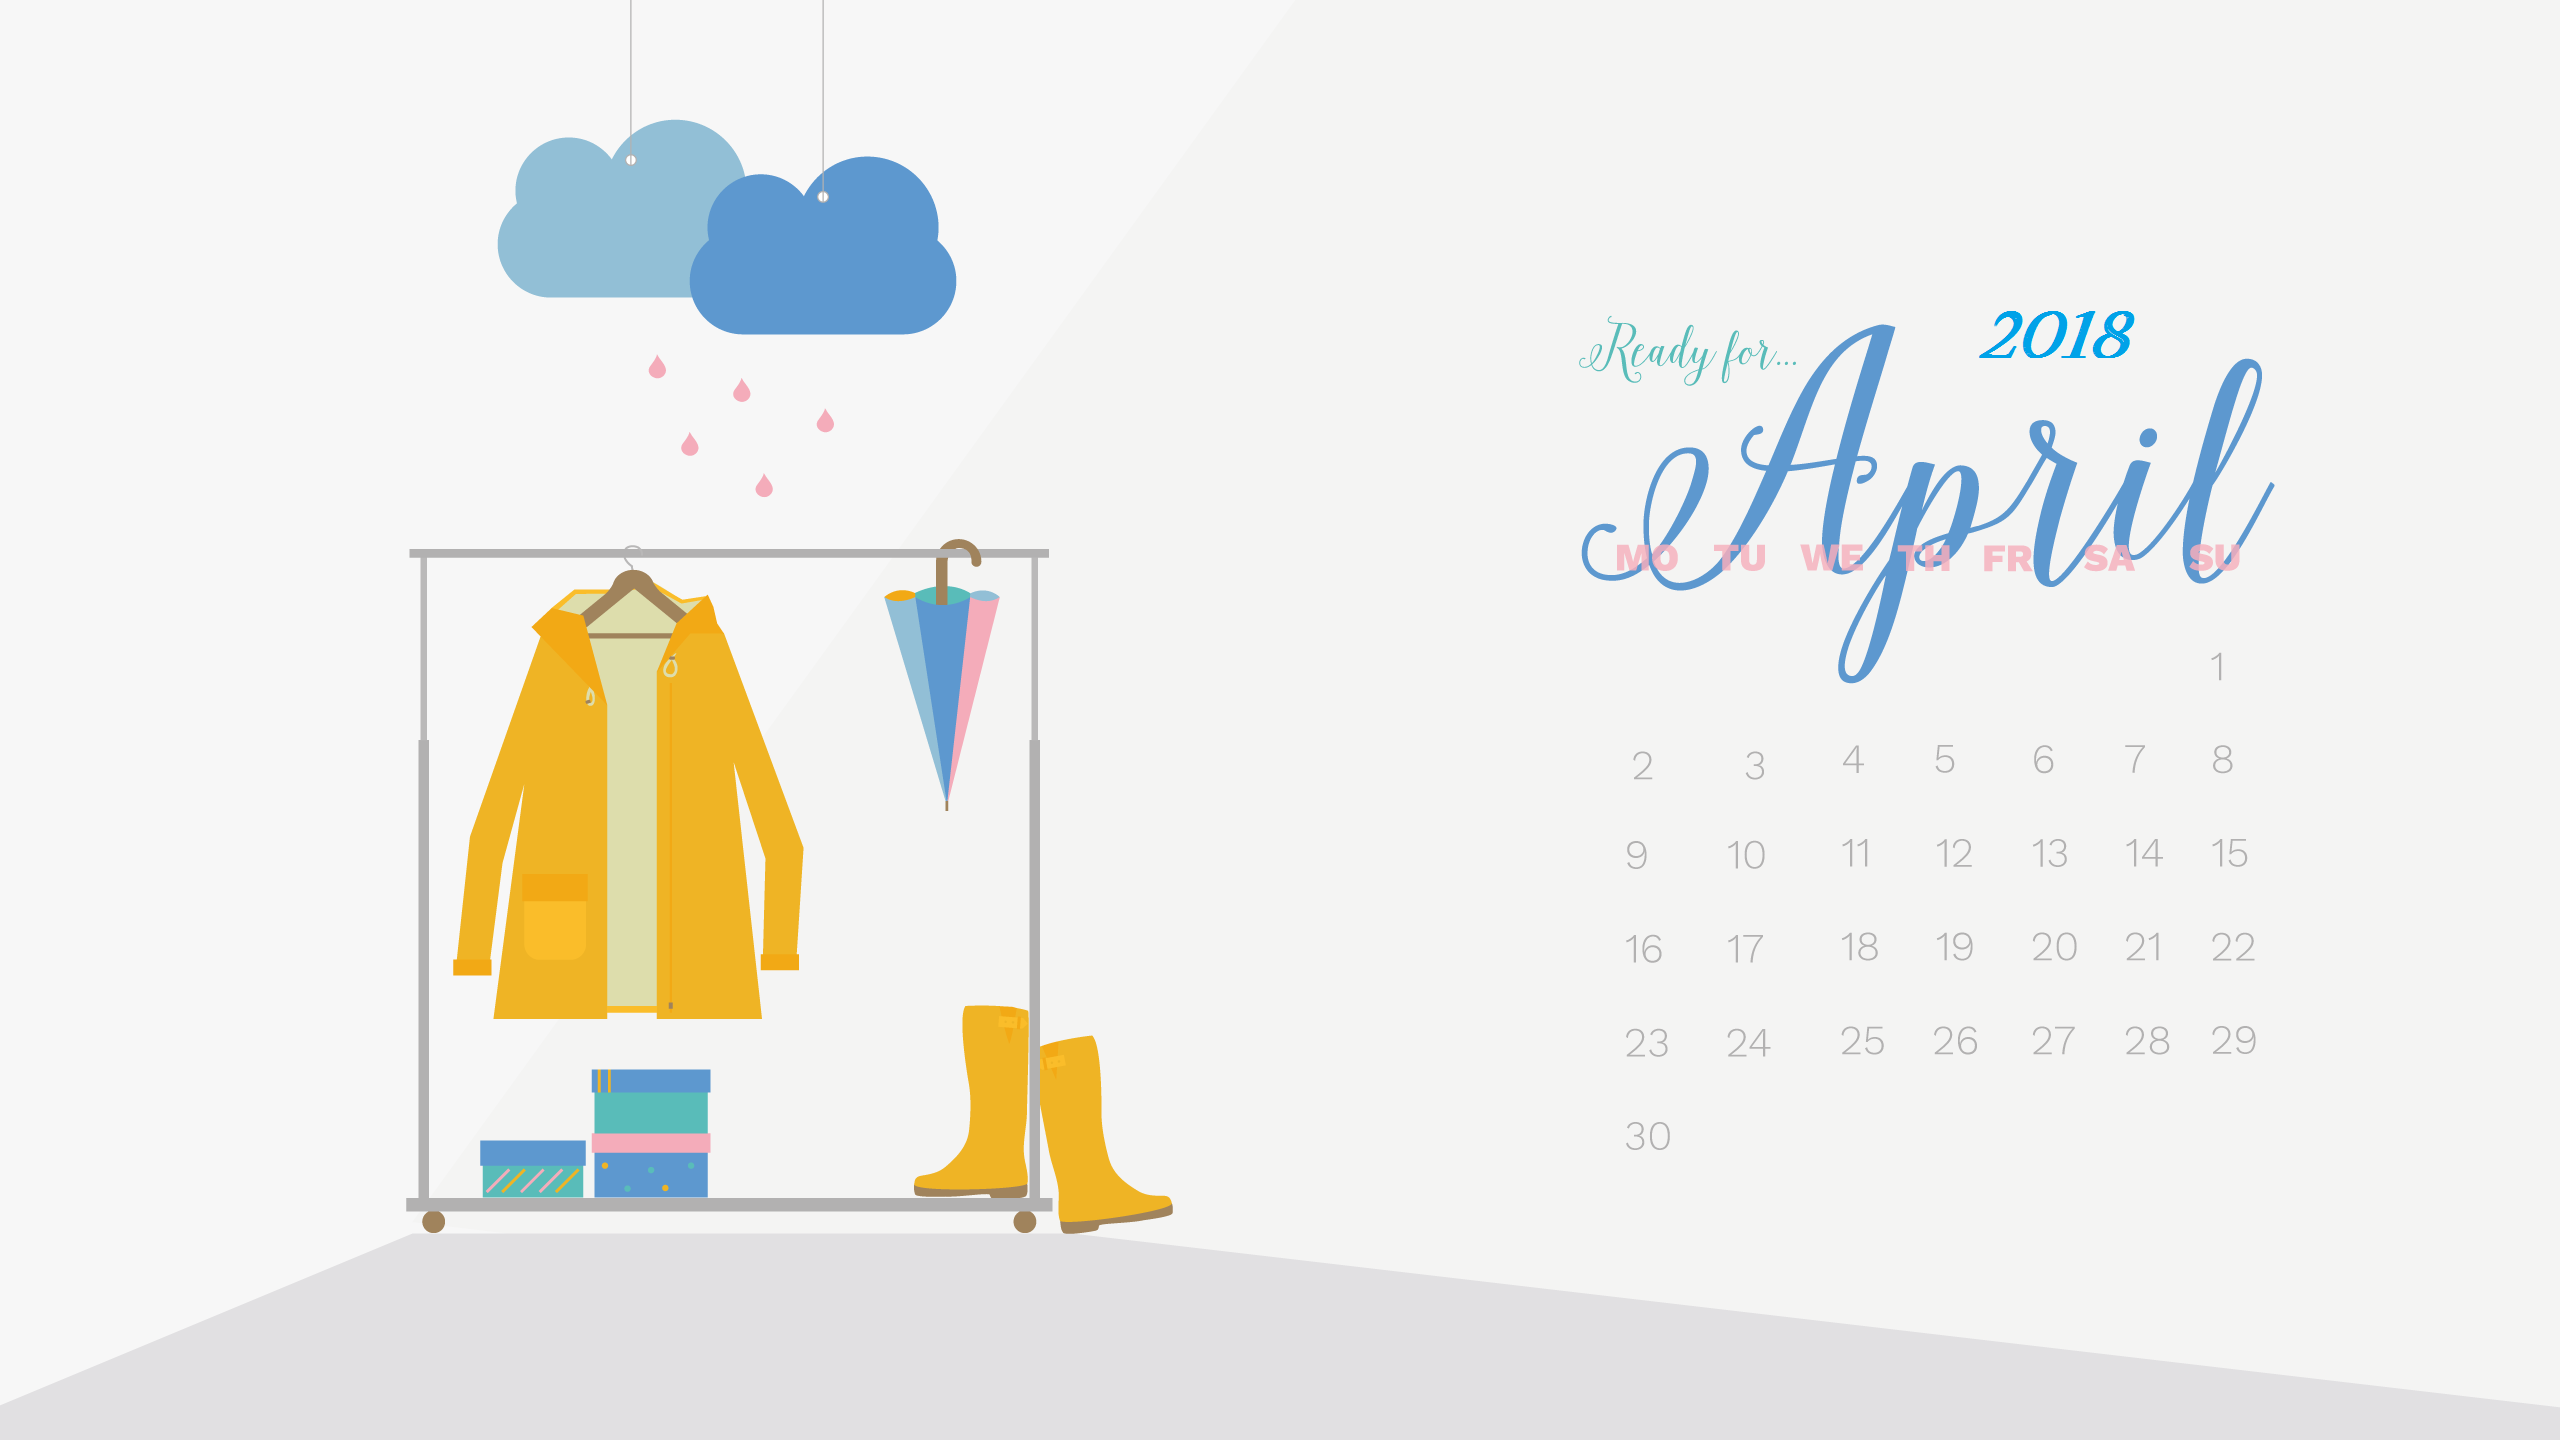 April 2018 HD Calendar Wallpapers Calendar 2018 Calendar 2560x1440